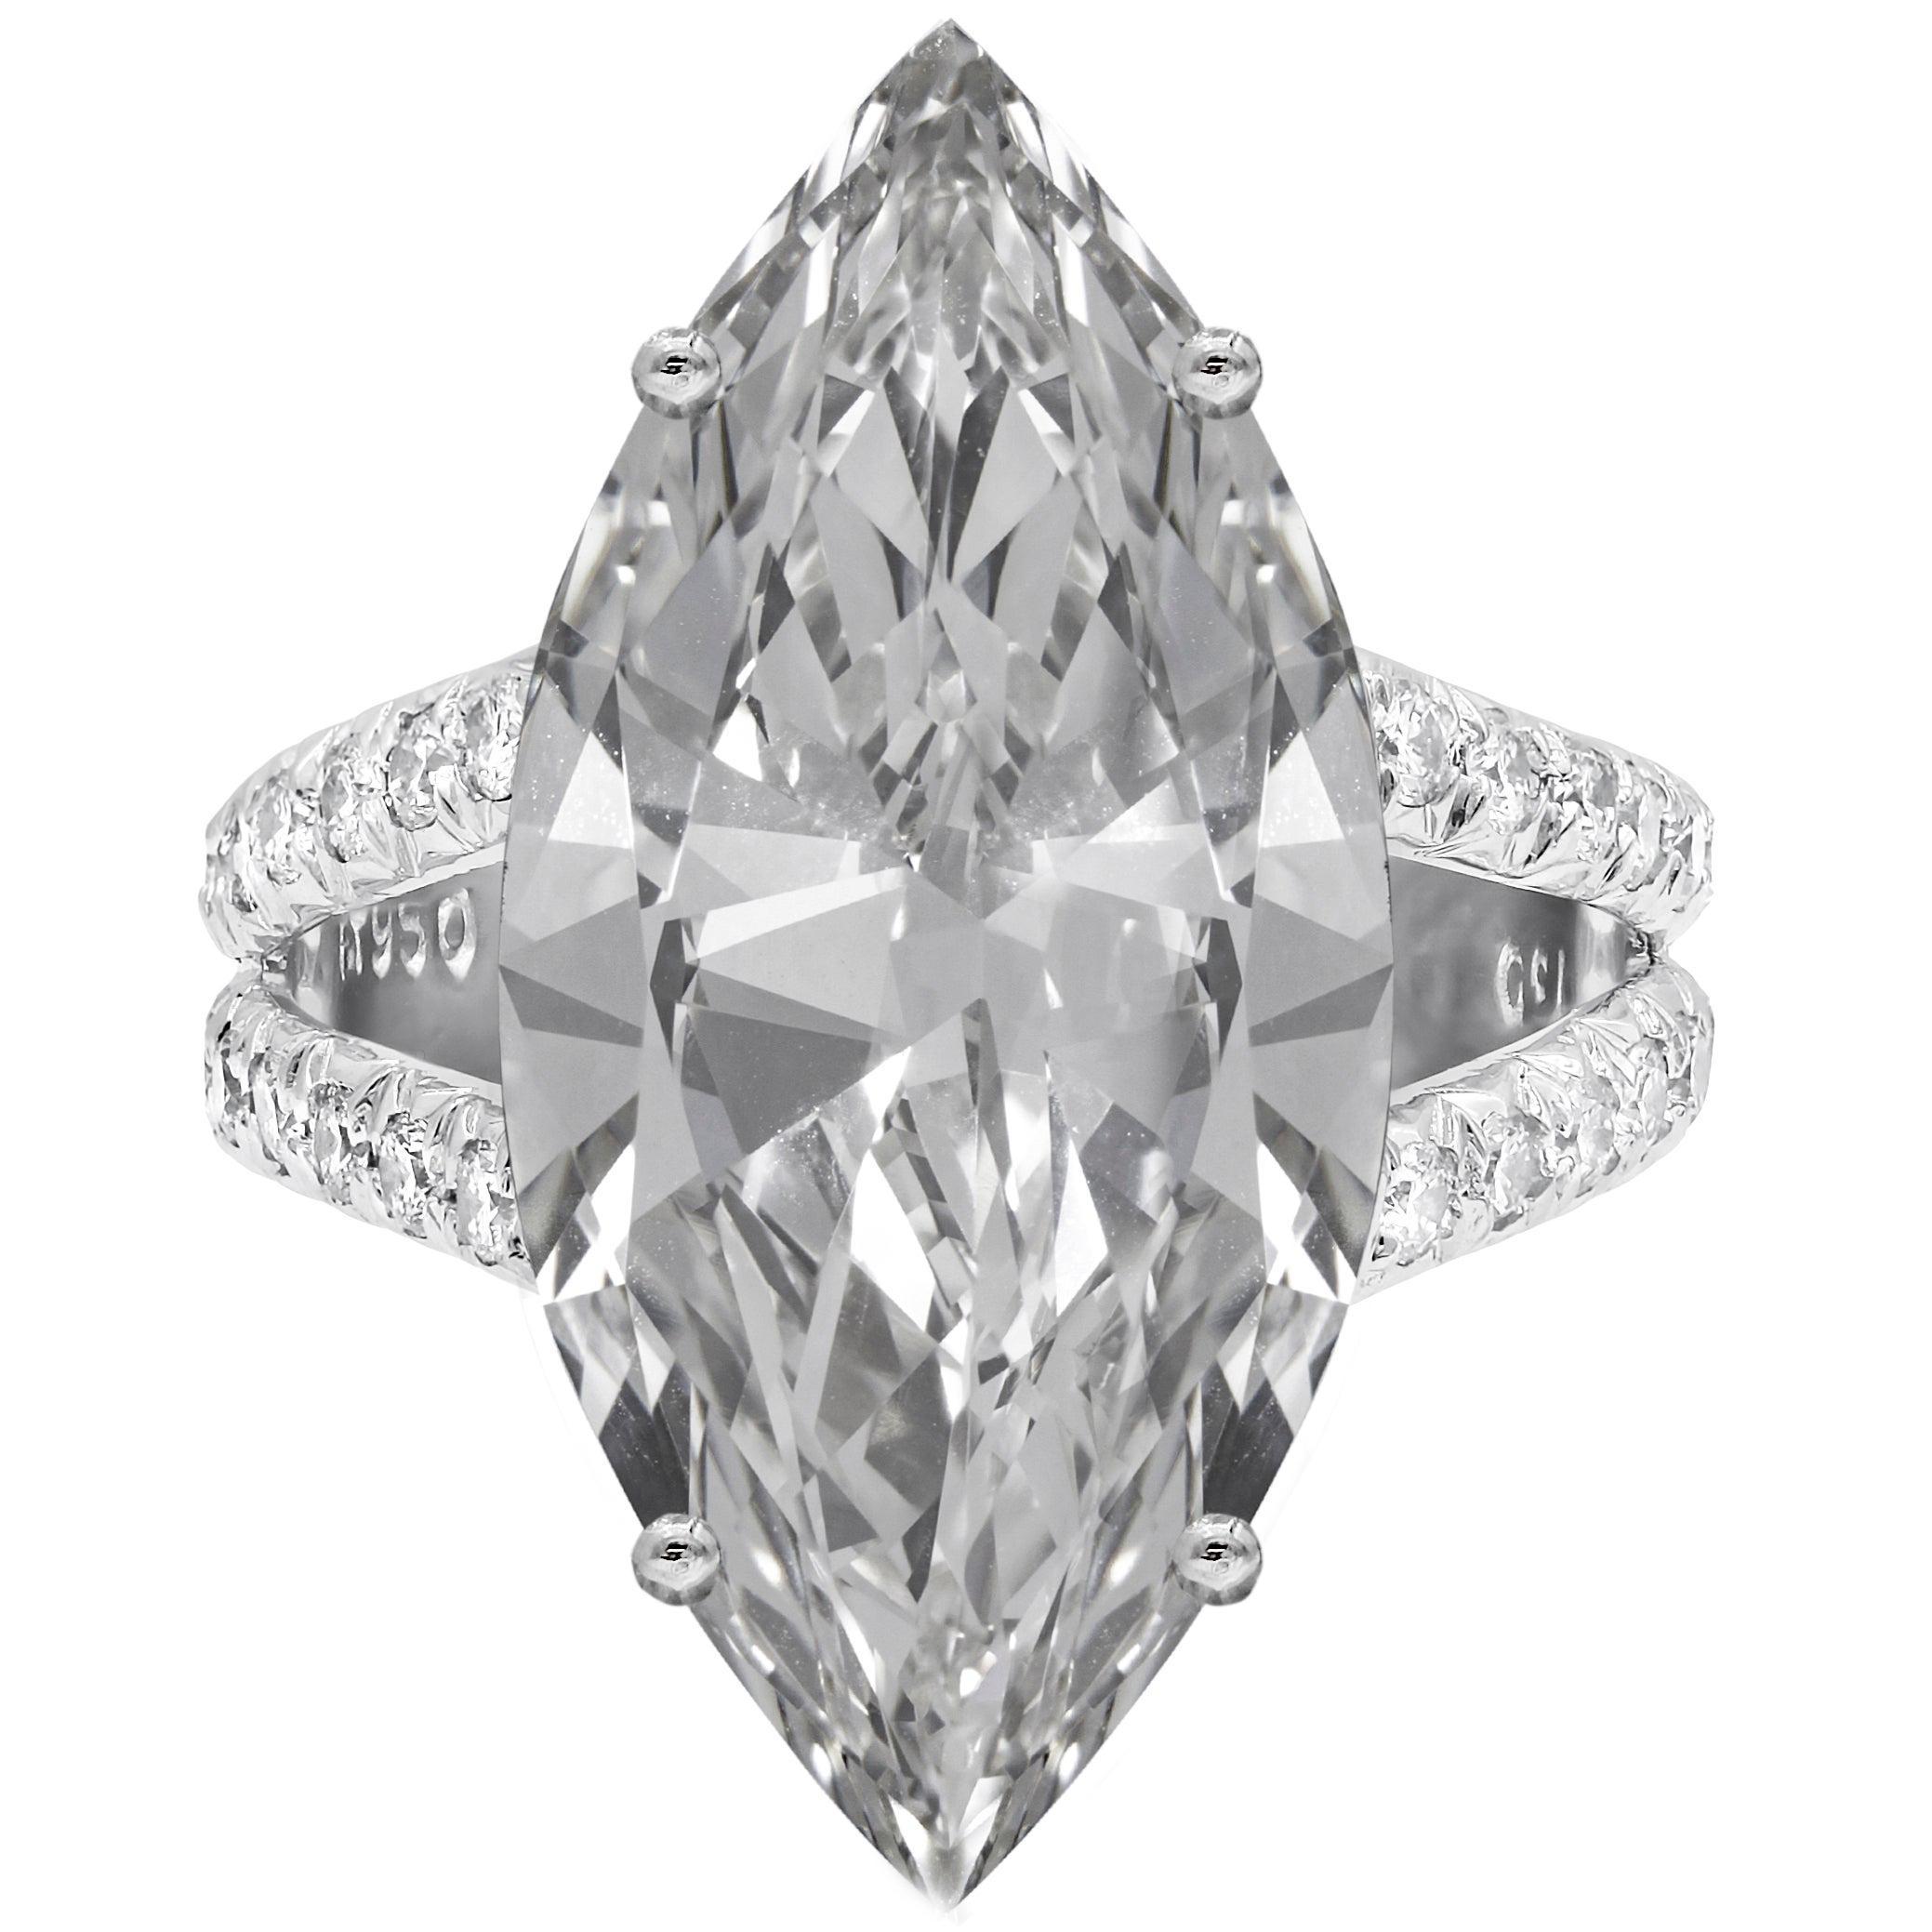 19.85 Carat Marquise Cut Flawless Diamond Ring